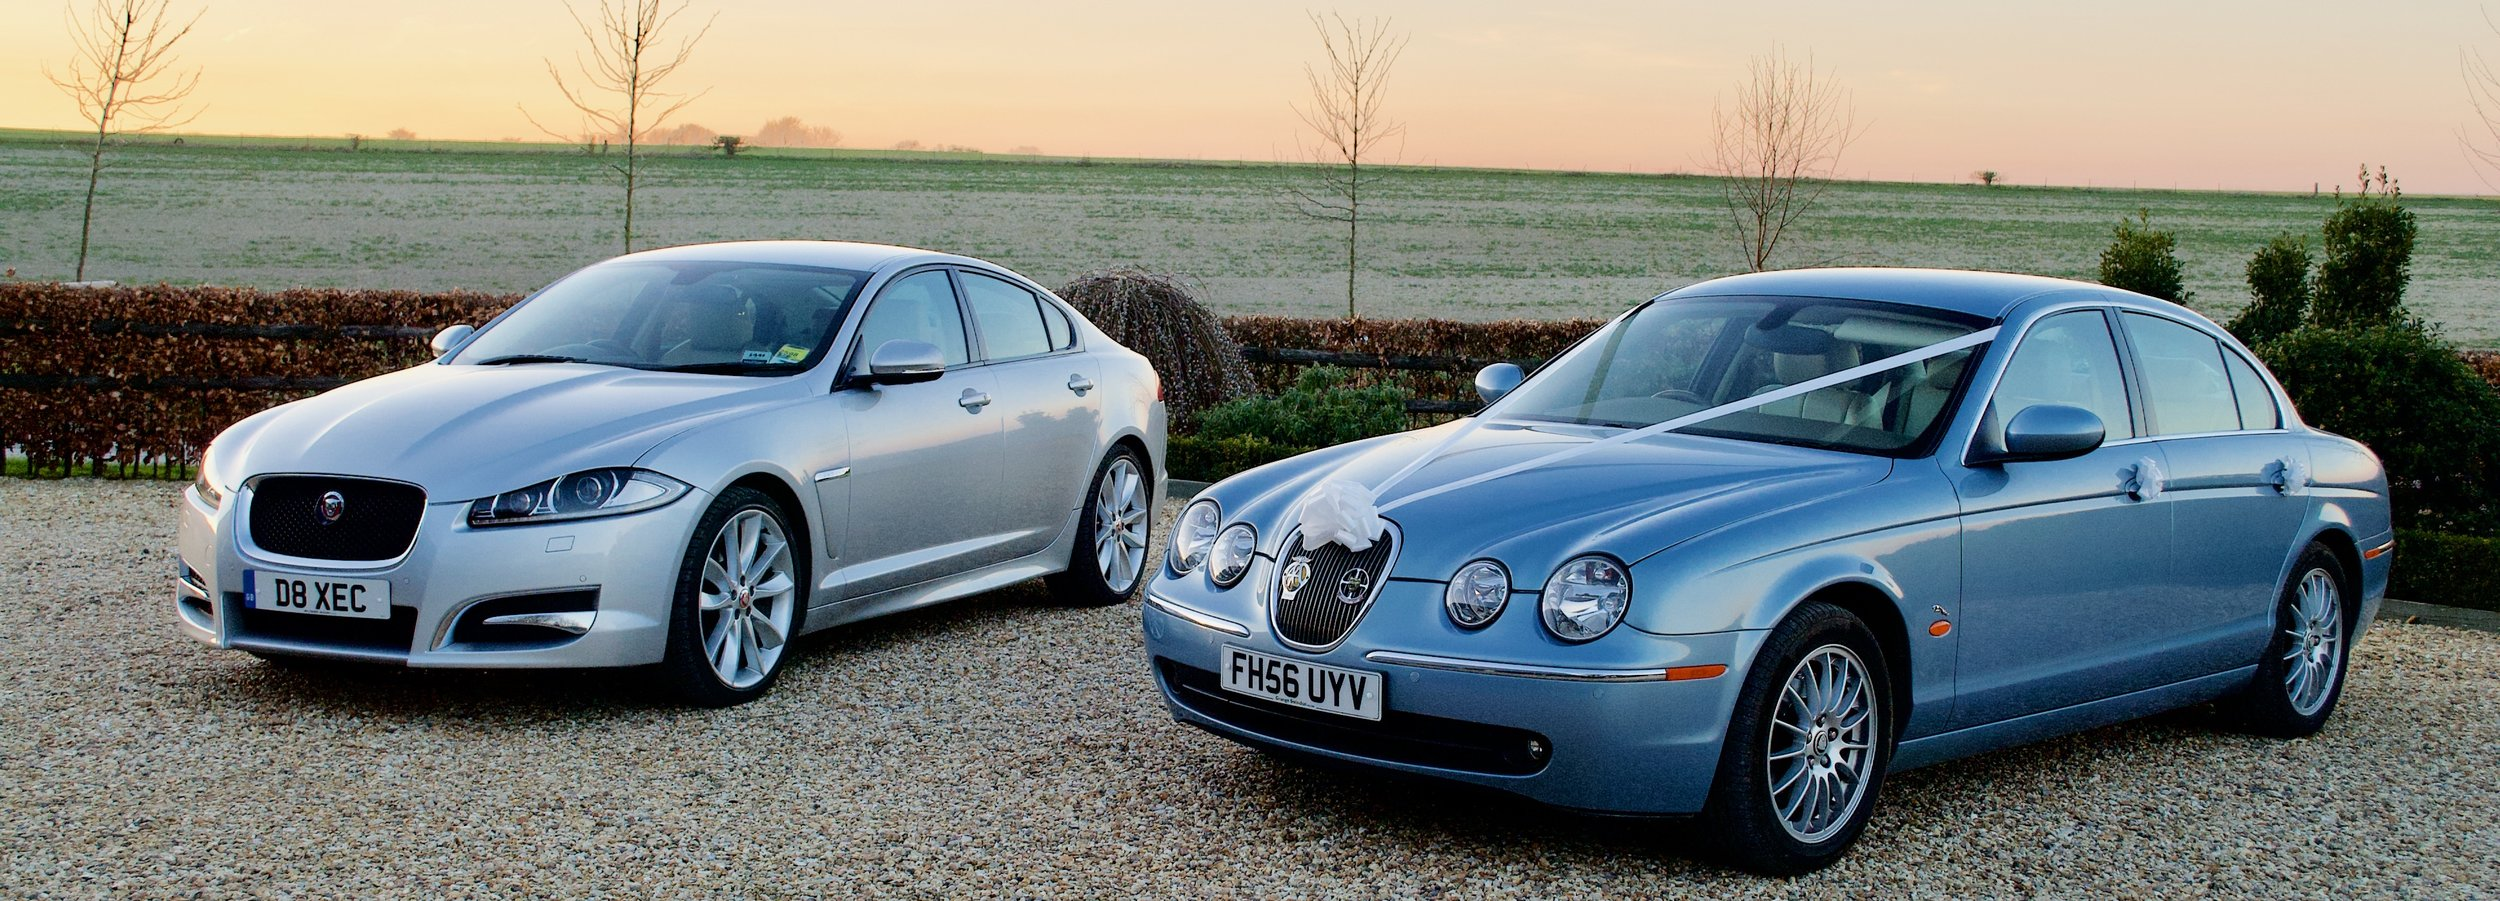 Executive Travel & Wedding Car